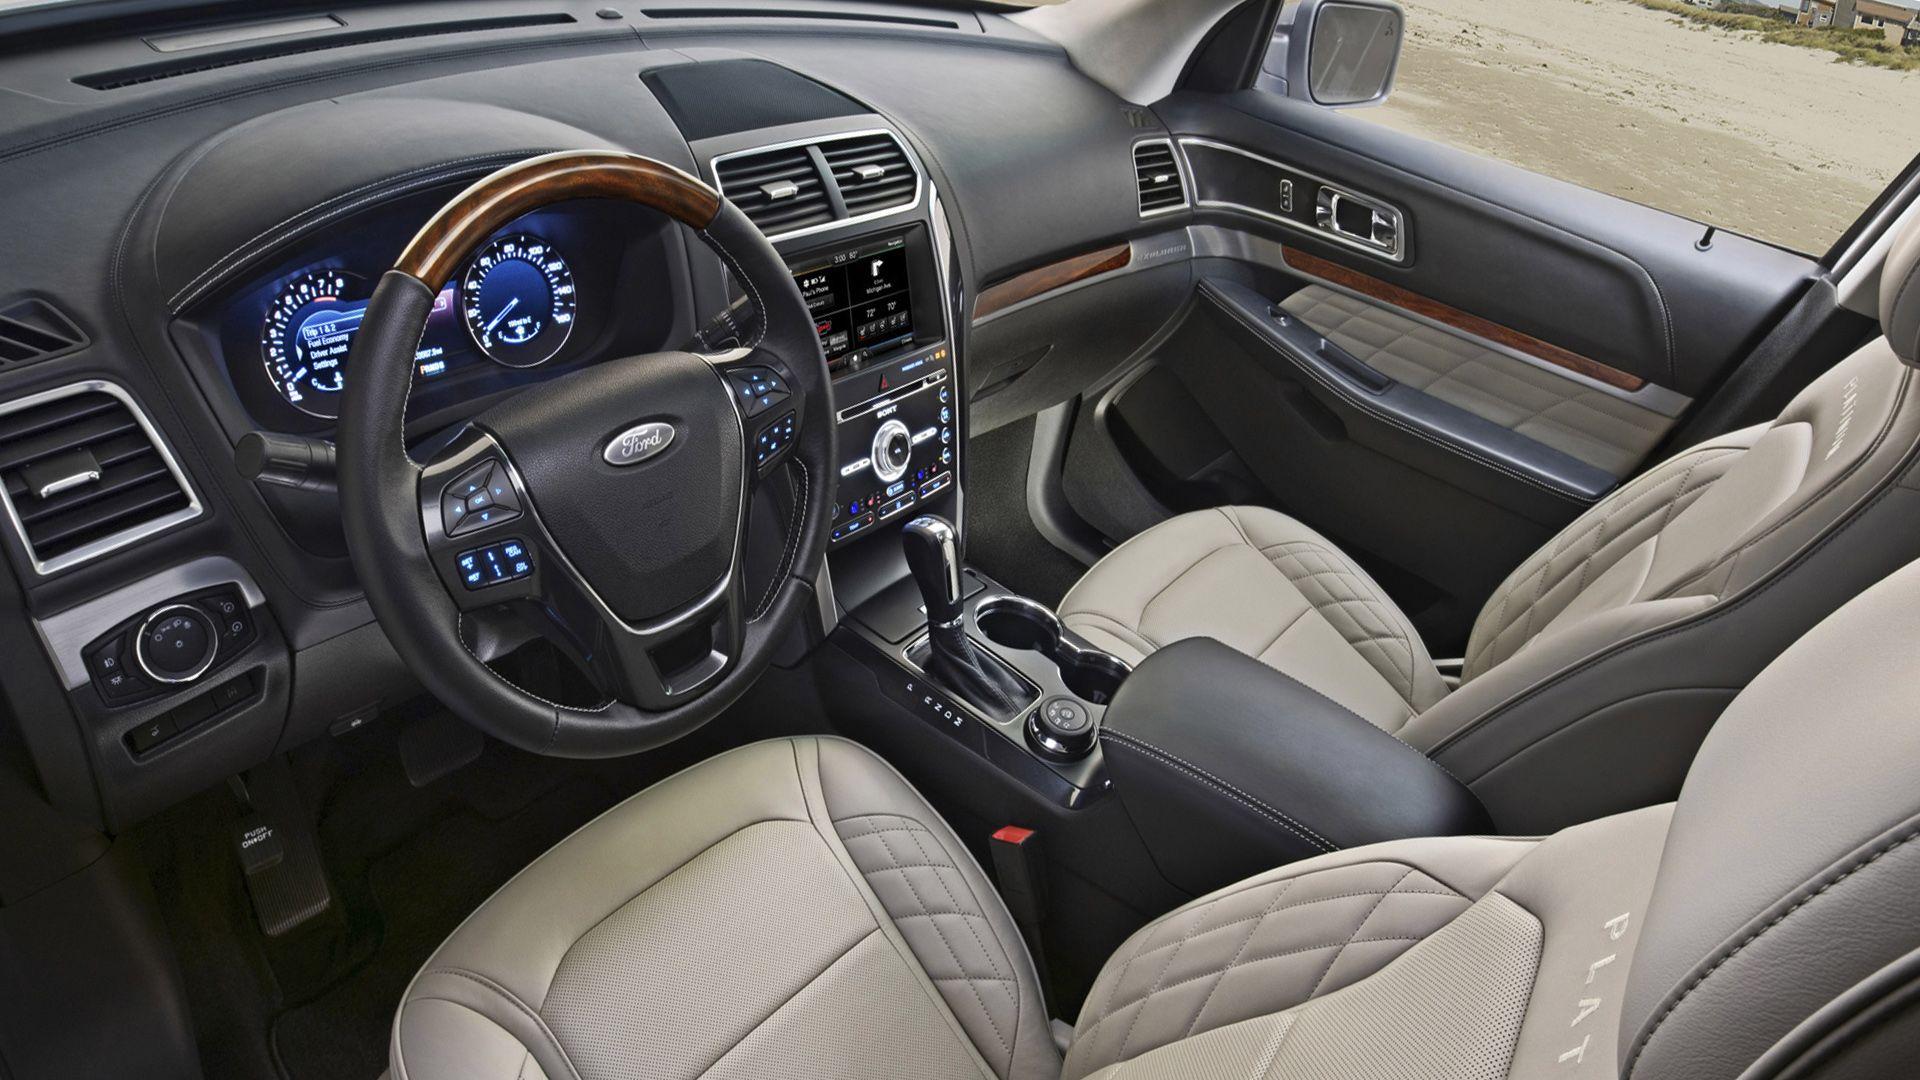 2019 Ford Explorer Interior Design